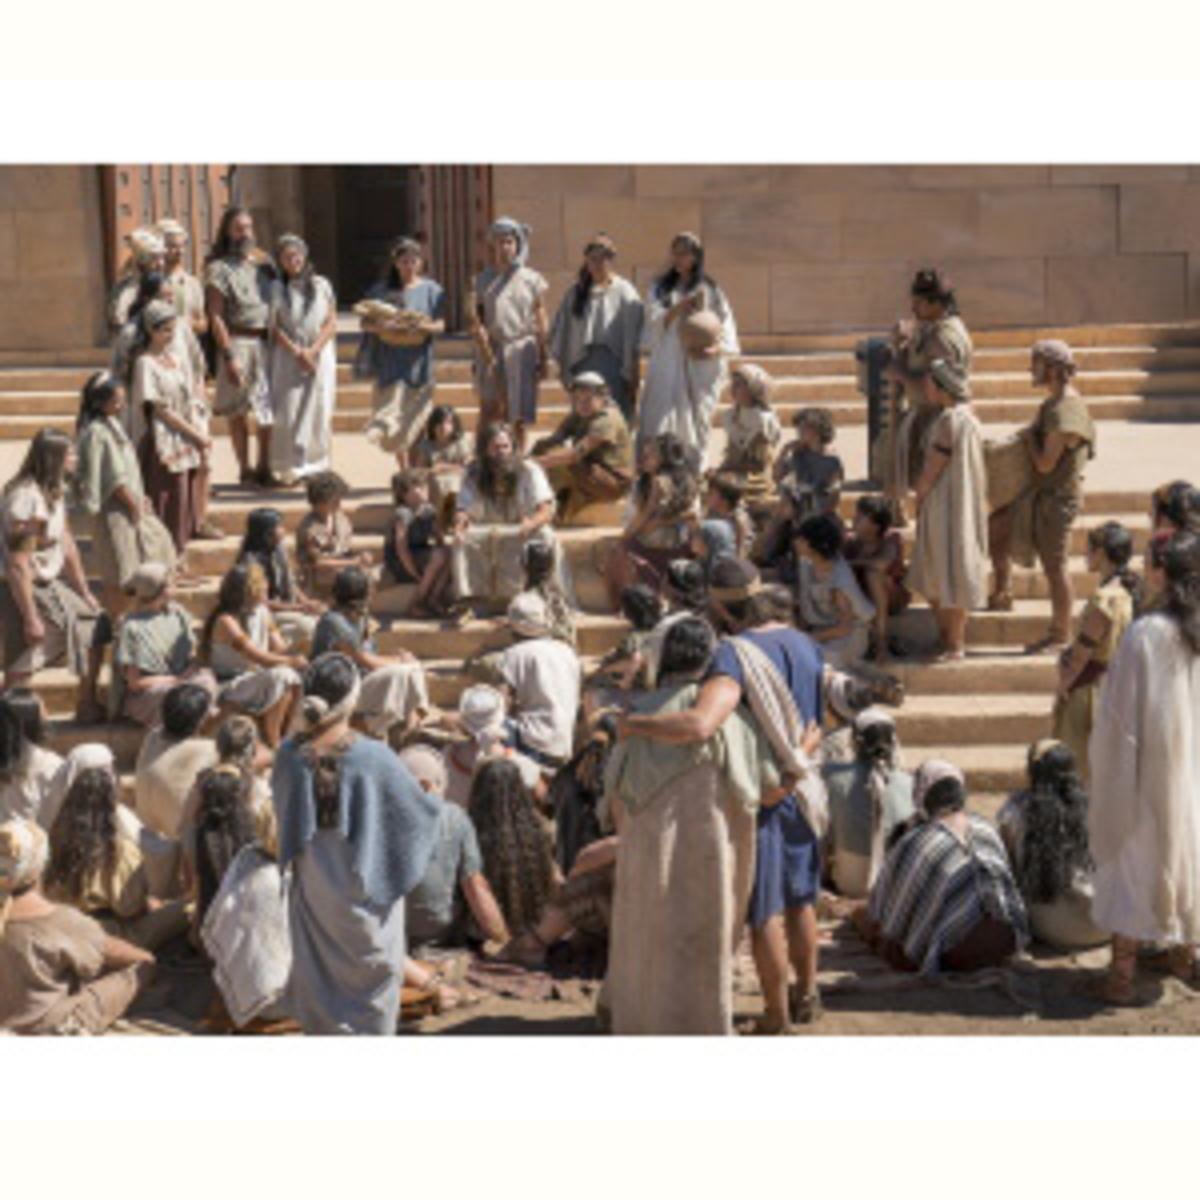 Jacob and the Nephites